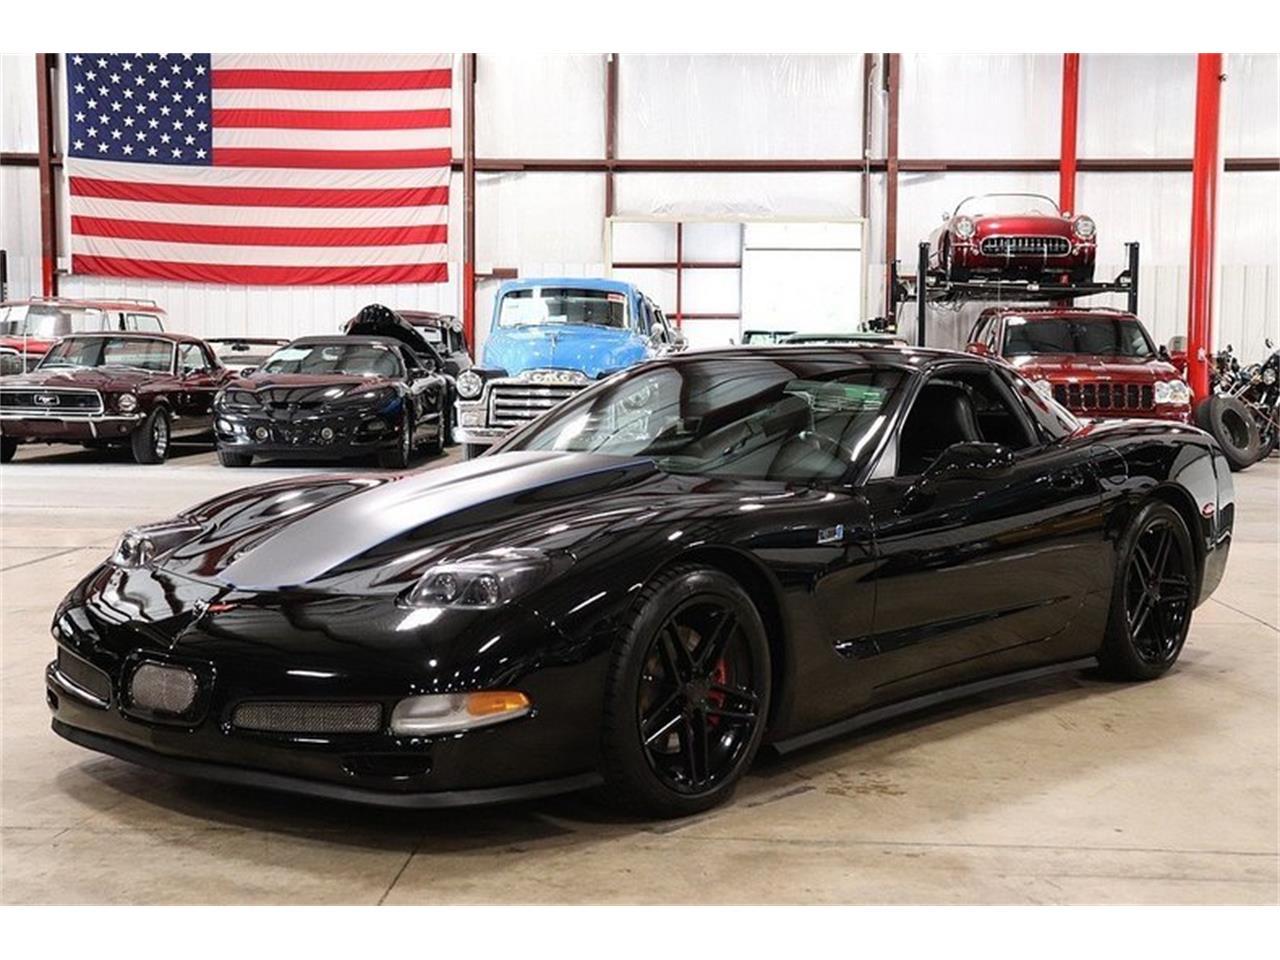 1997 Corvette For Sale >> For Sale 1997 Chevrolet Corvette In Kentwood Michigan